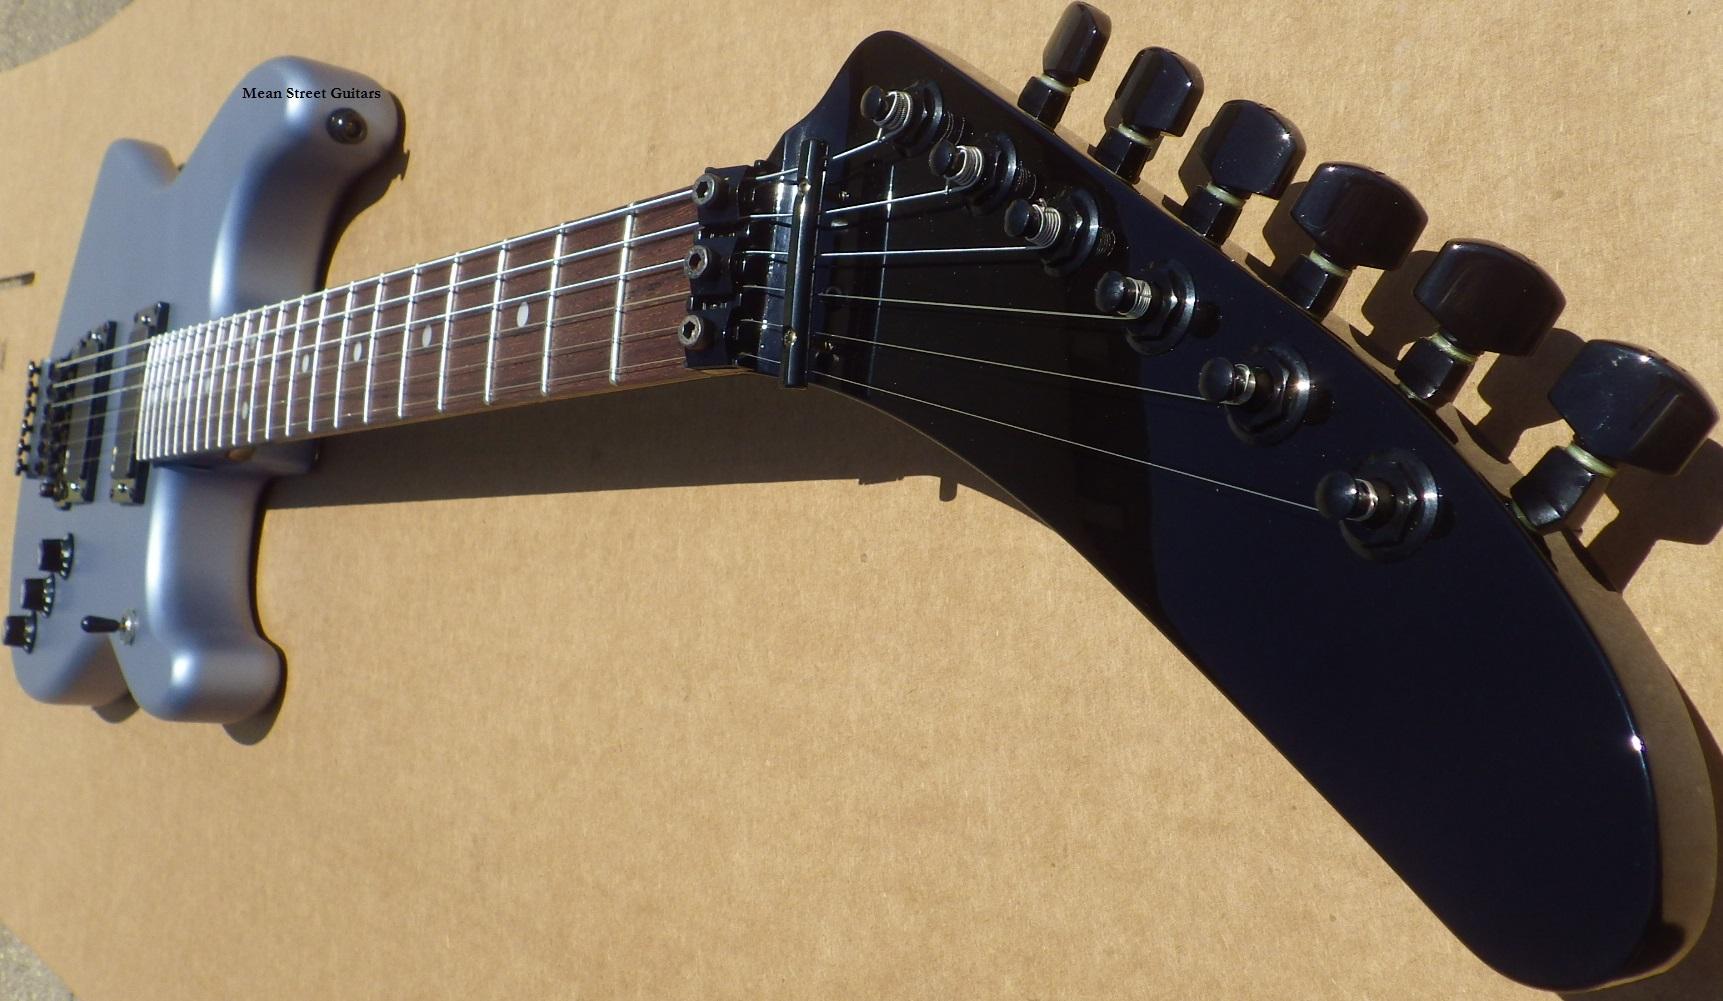 Mean Street Guitars ATH Tour Model no graphic Ryan G pic 12.jpg